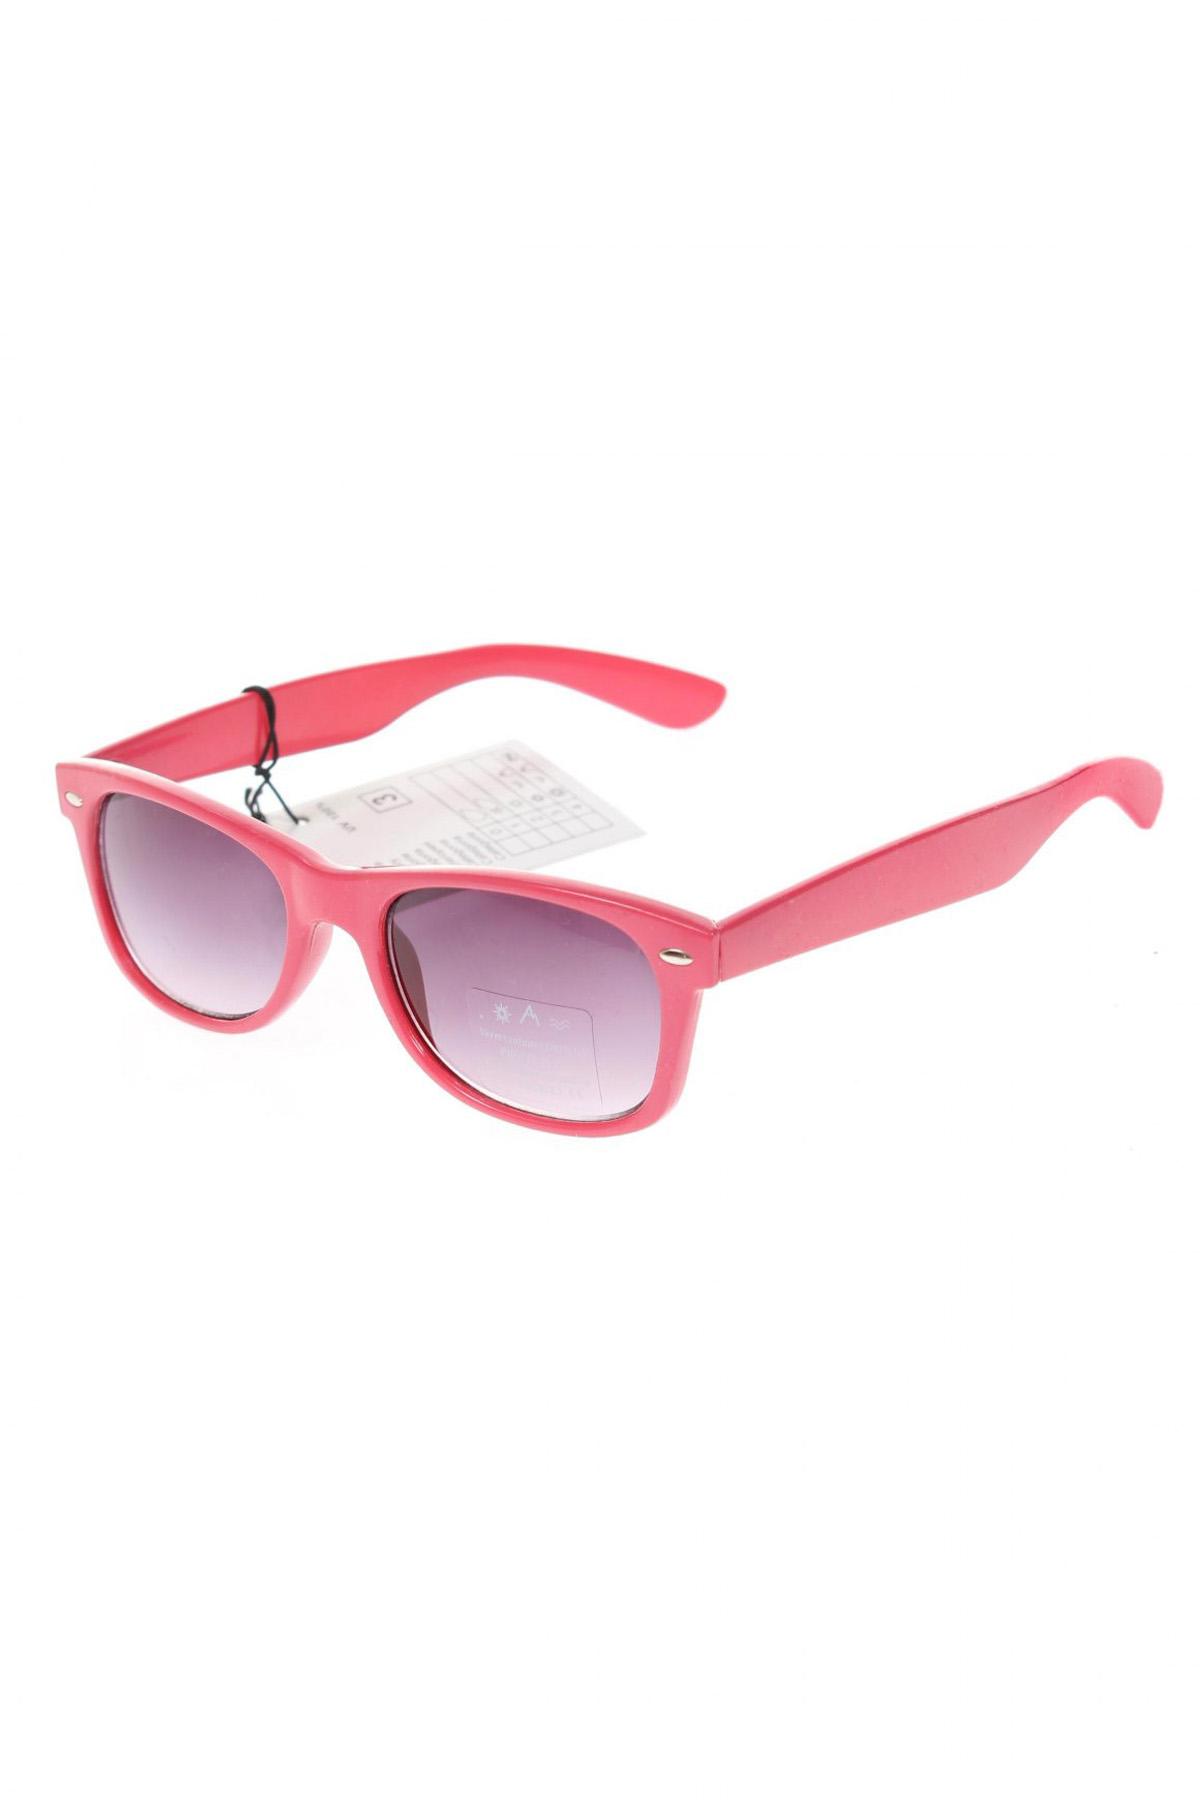 333bc8f83d Γυαλιά ηλίου - αγοράστε σε συμφέρουσες τιμές στο Remix